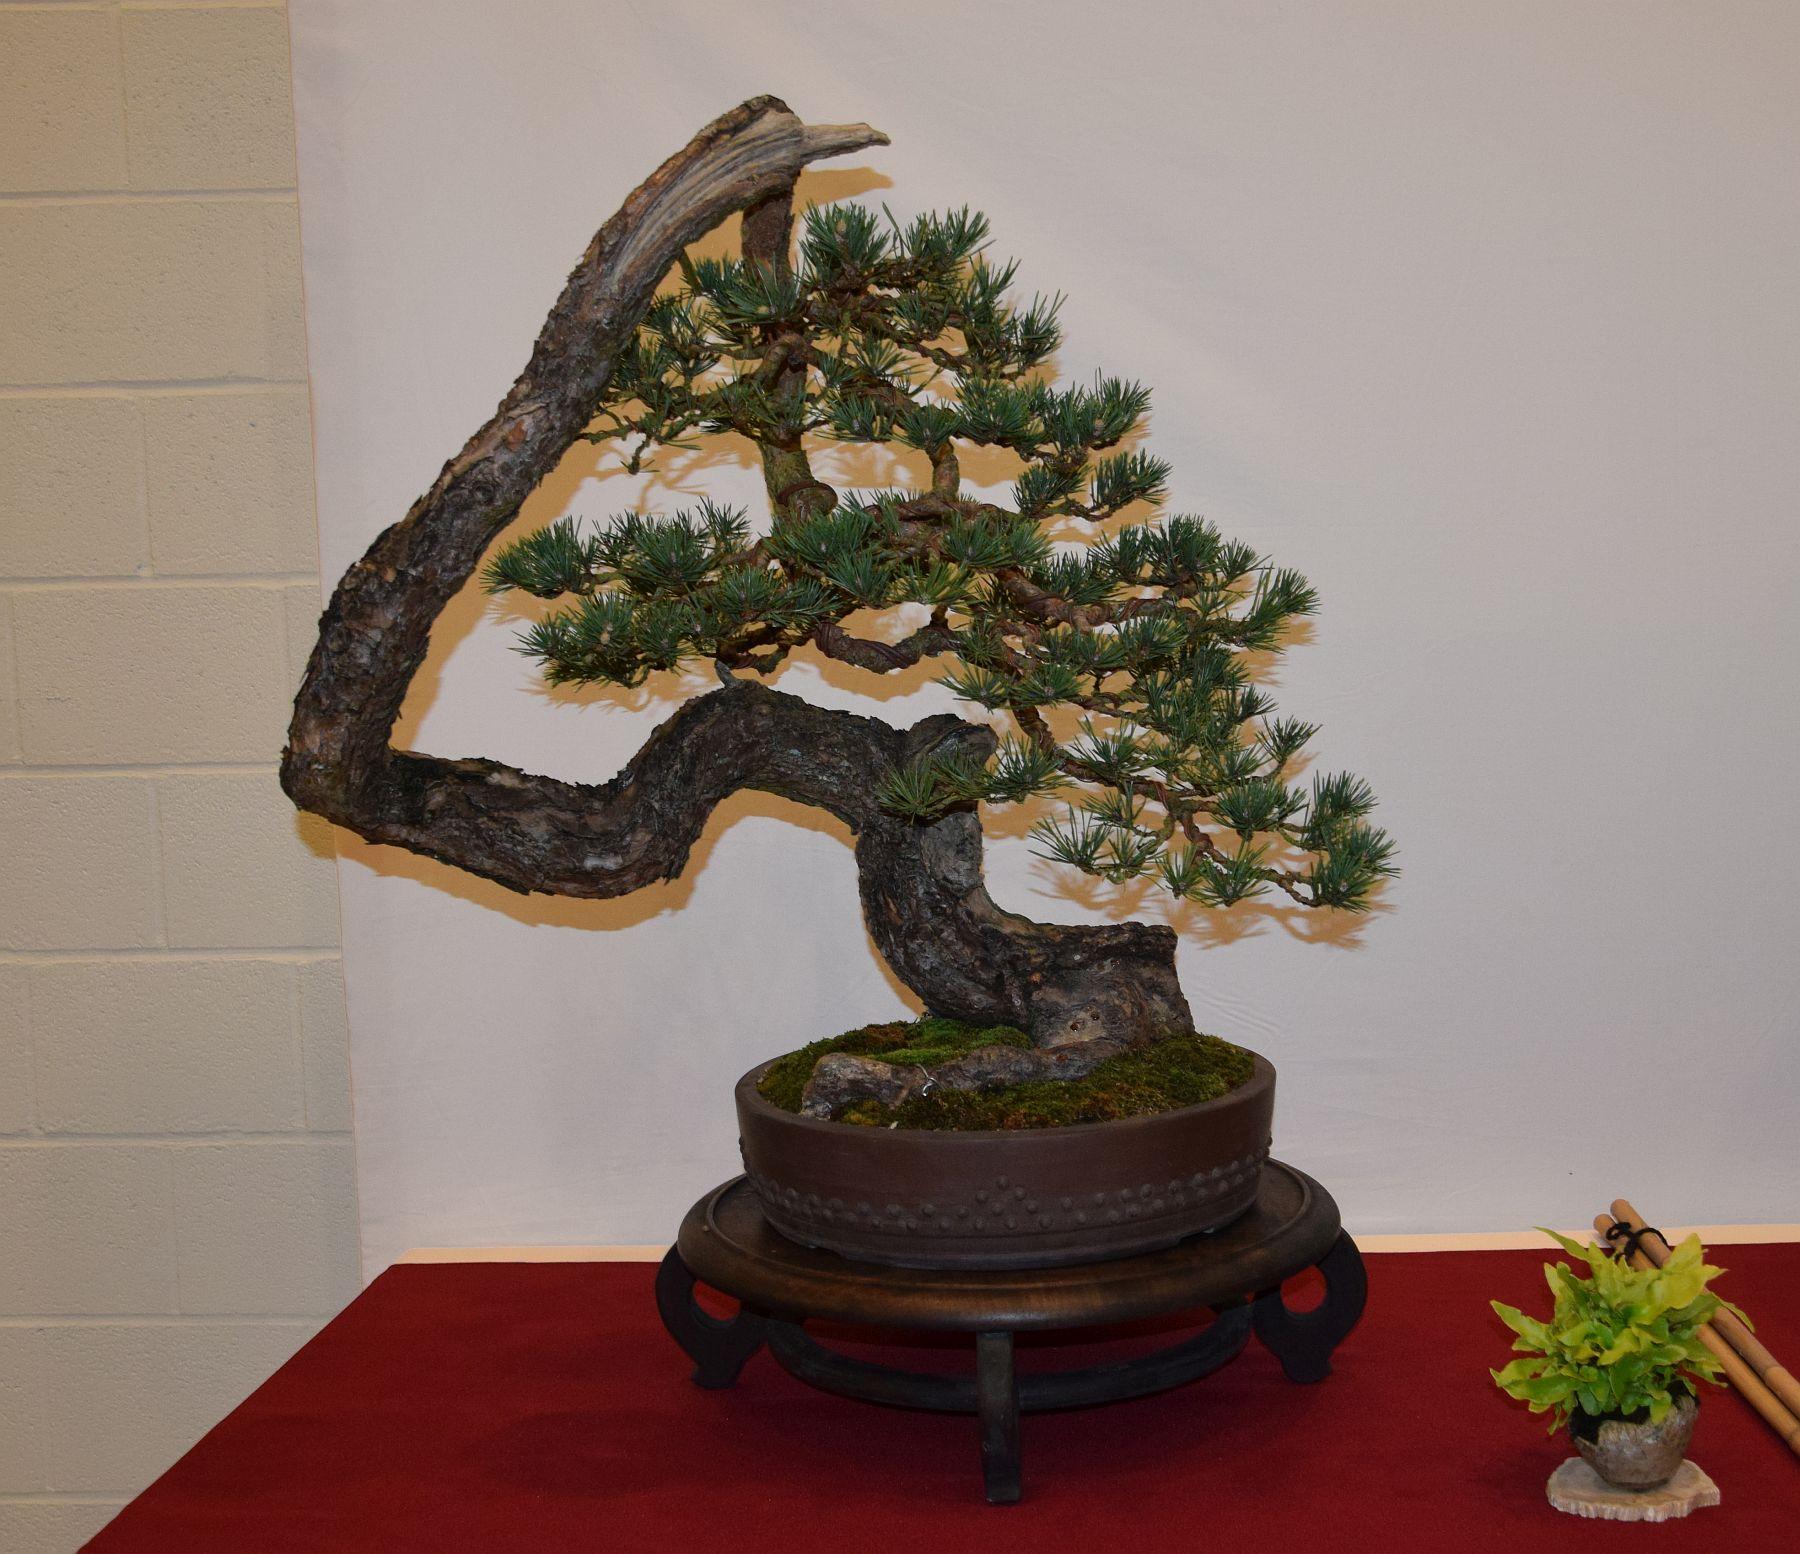 euk-bonsai-ten-2016-club-bonsai-071